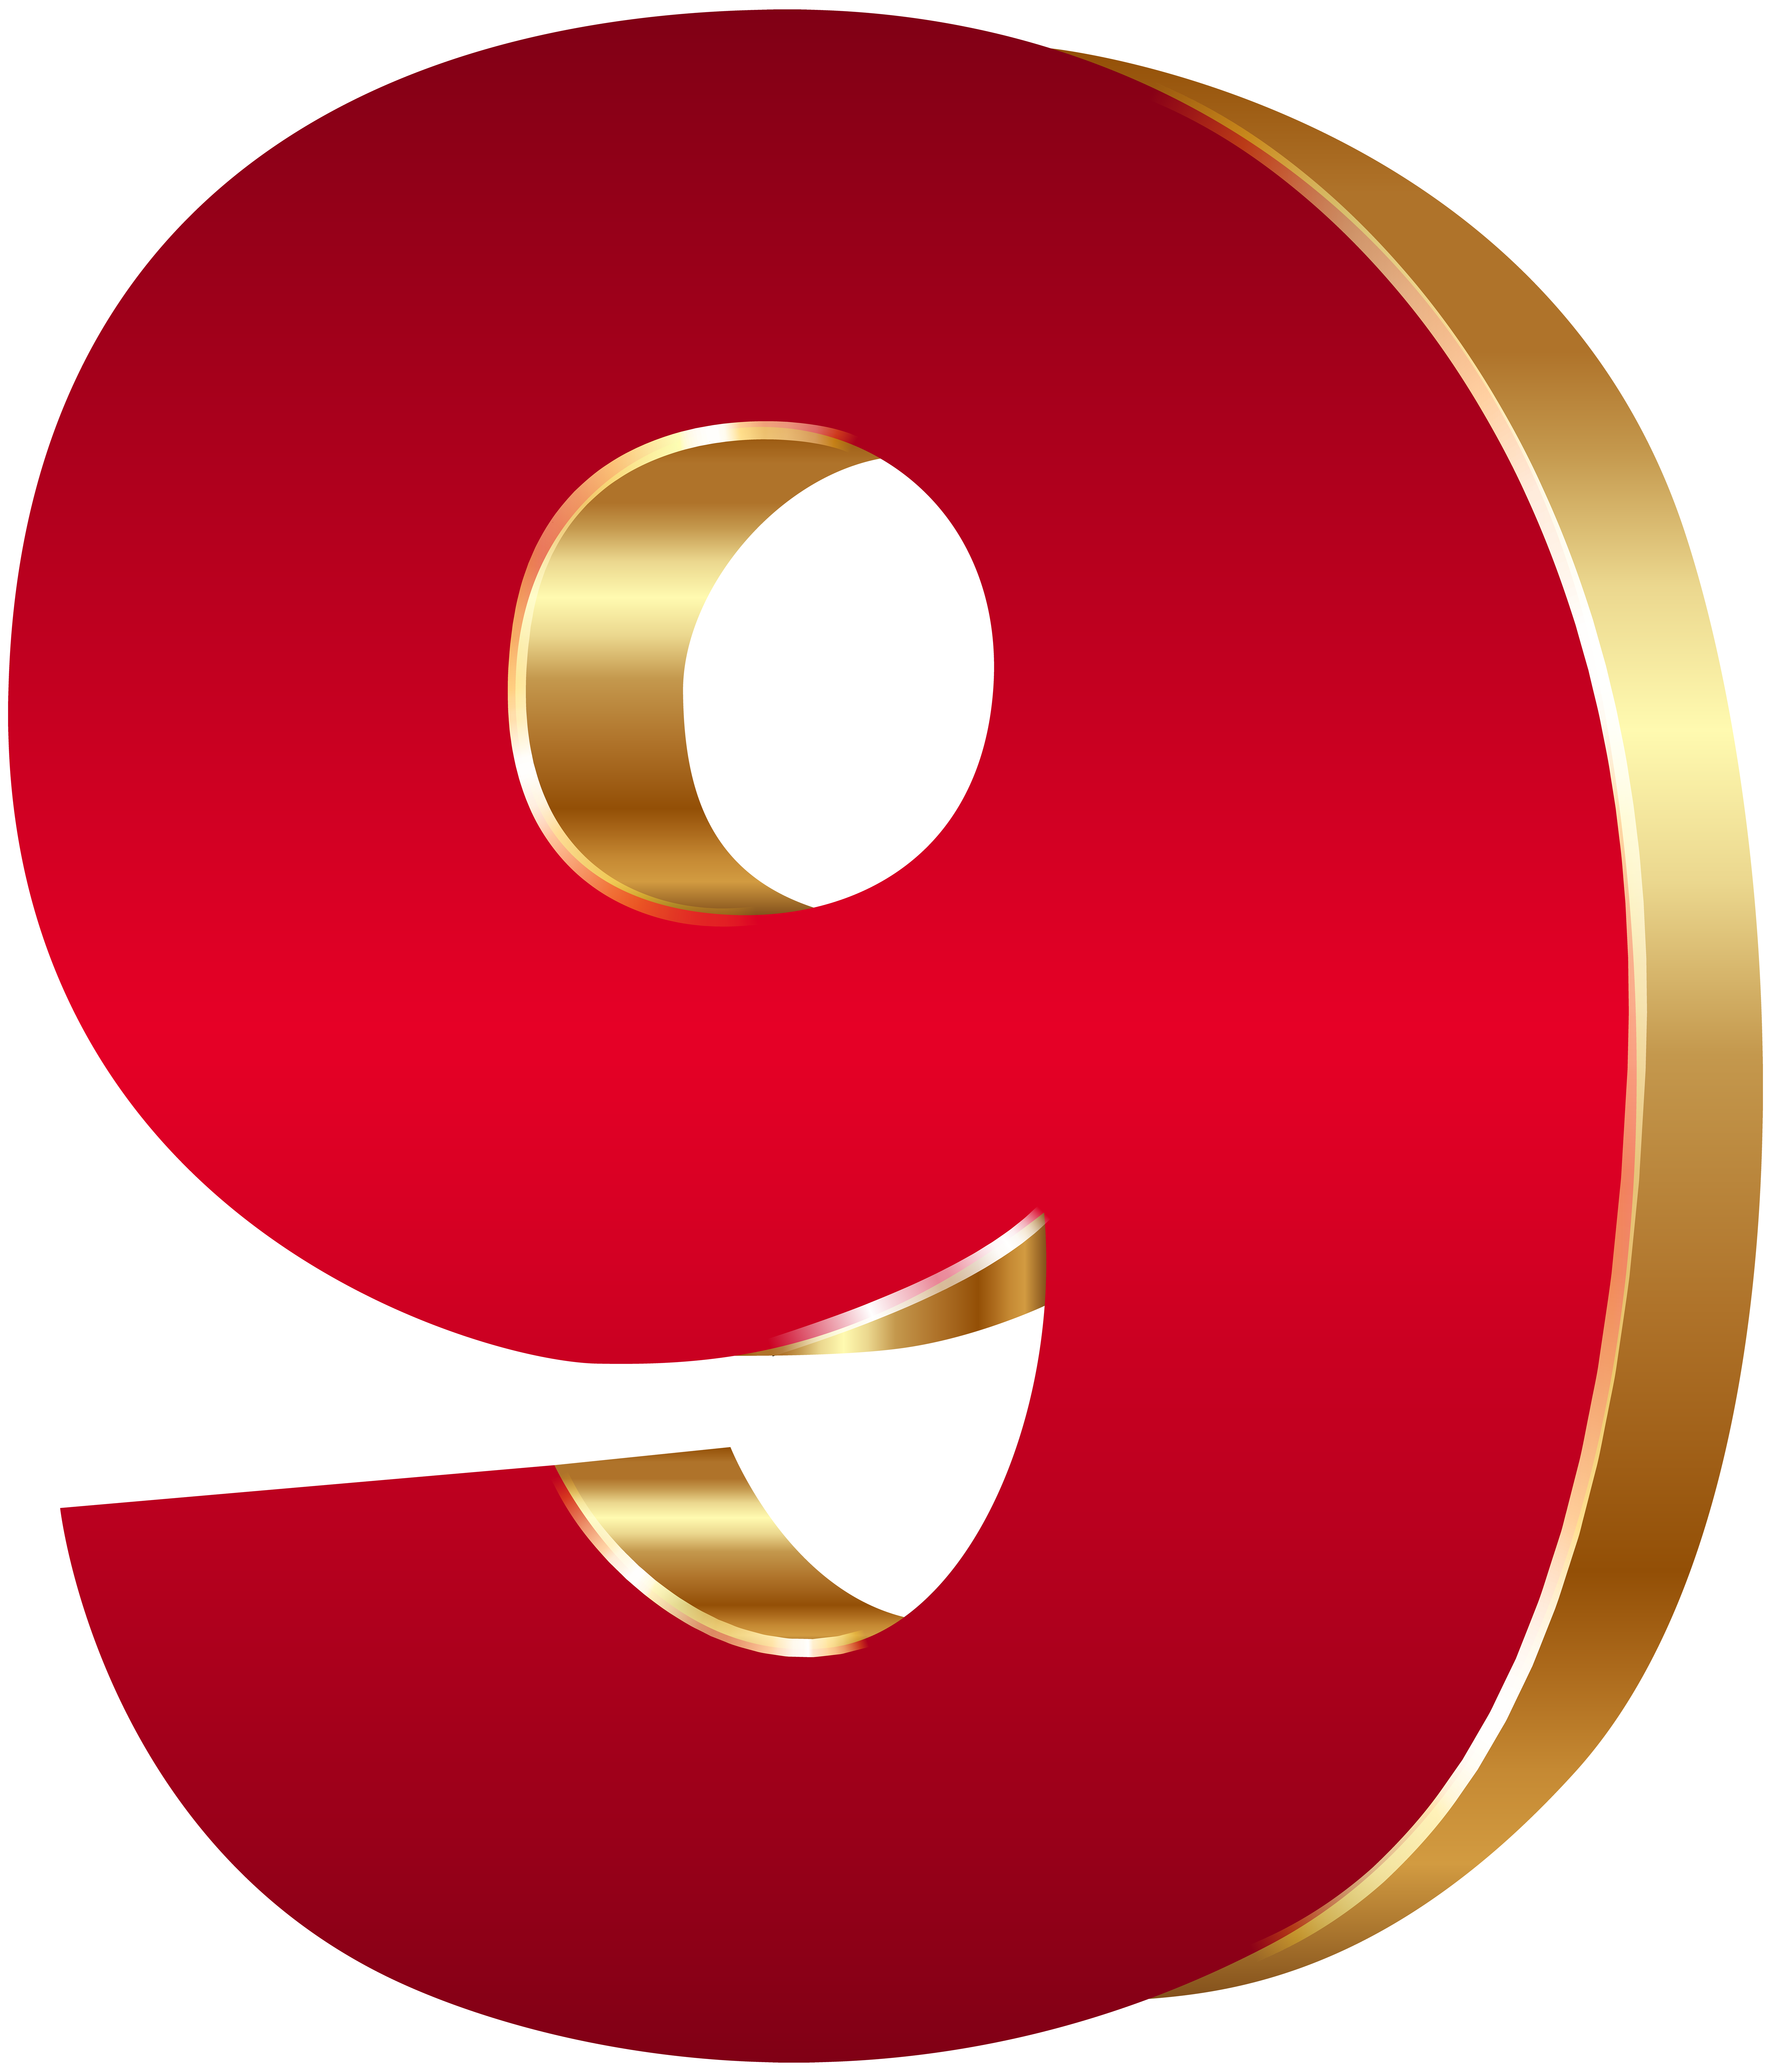 Nine at getdrawings com. Clipart teacher number